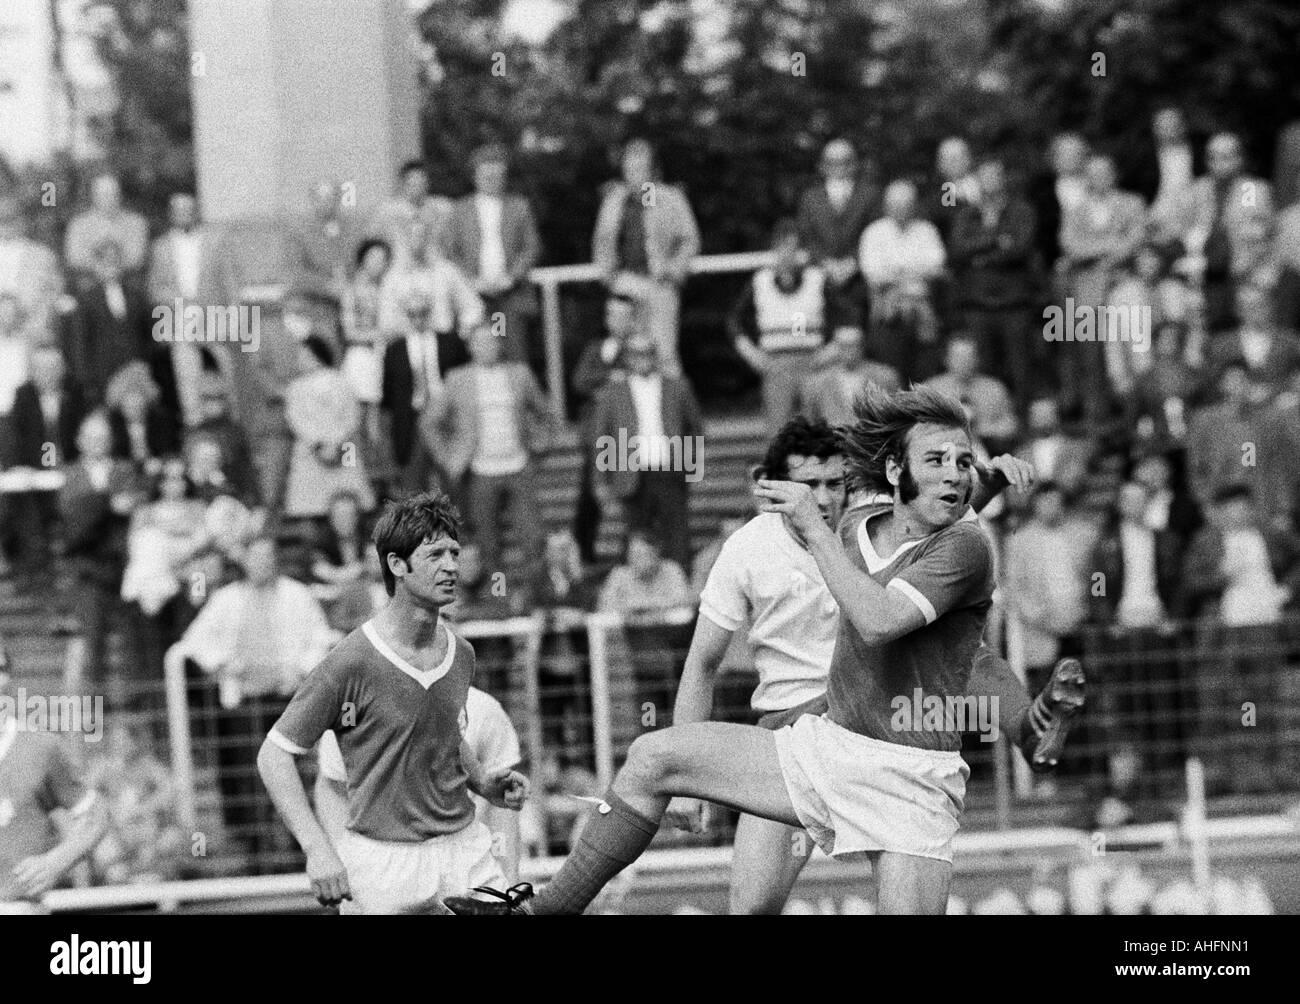 football, Bundesliga, 1971/1972, Rot-Weiss Oberhausen versus Werder Bremen 2:2, Niederrhein Stadium in Oberhausen, scene of the match, f.l.t.r. Arnold Schuetz (Bremen), Ludwig Denz (RWO), Willi Goetz (Bremen) - Stock Image